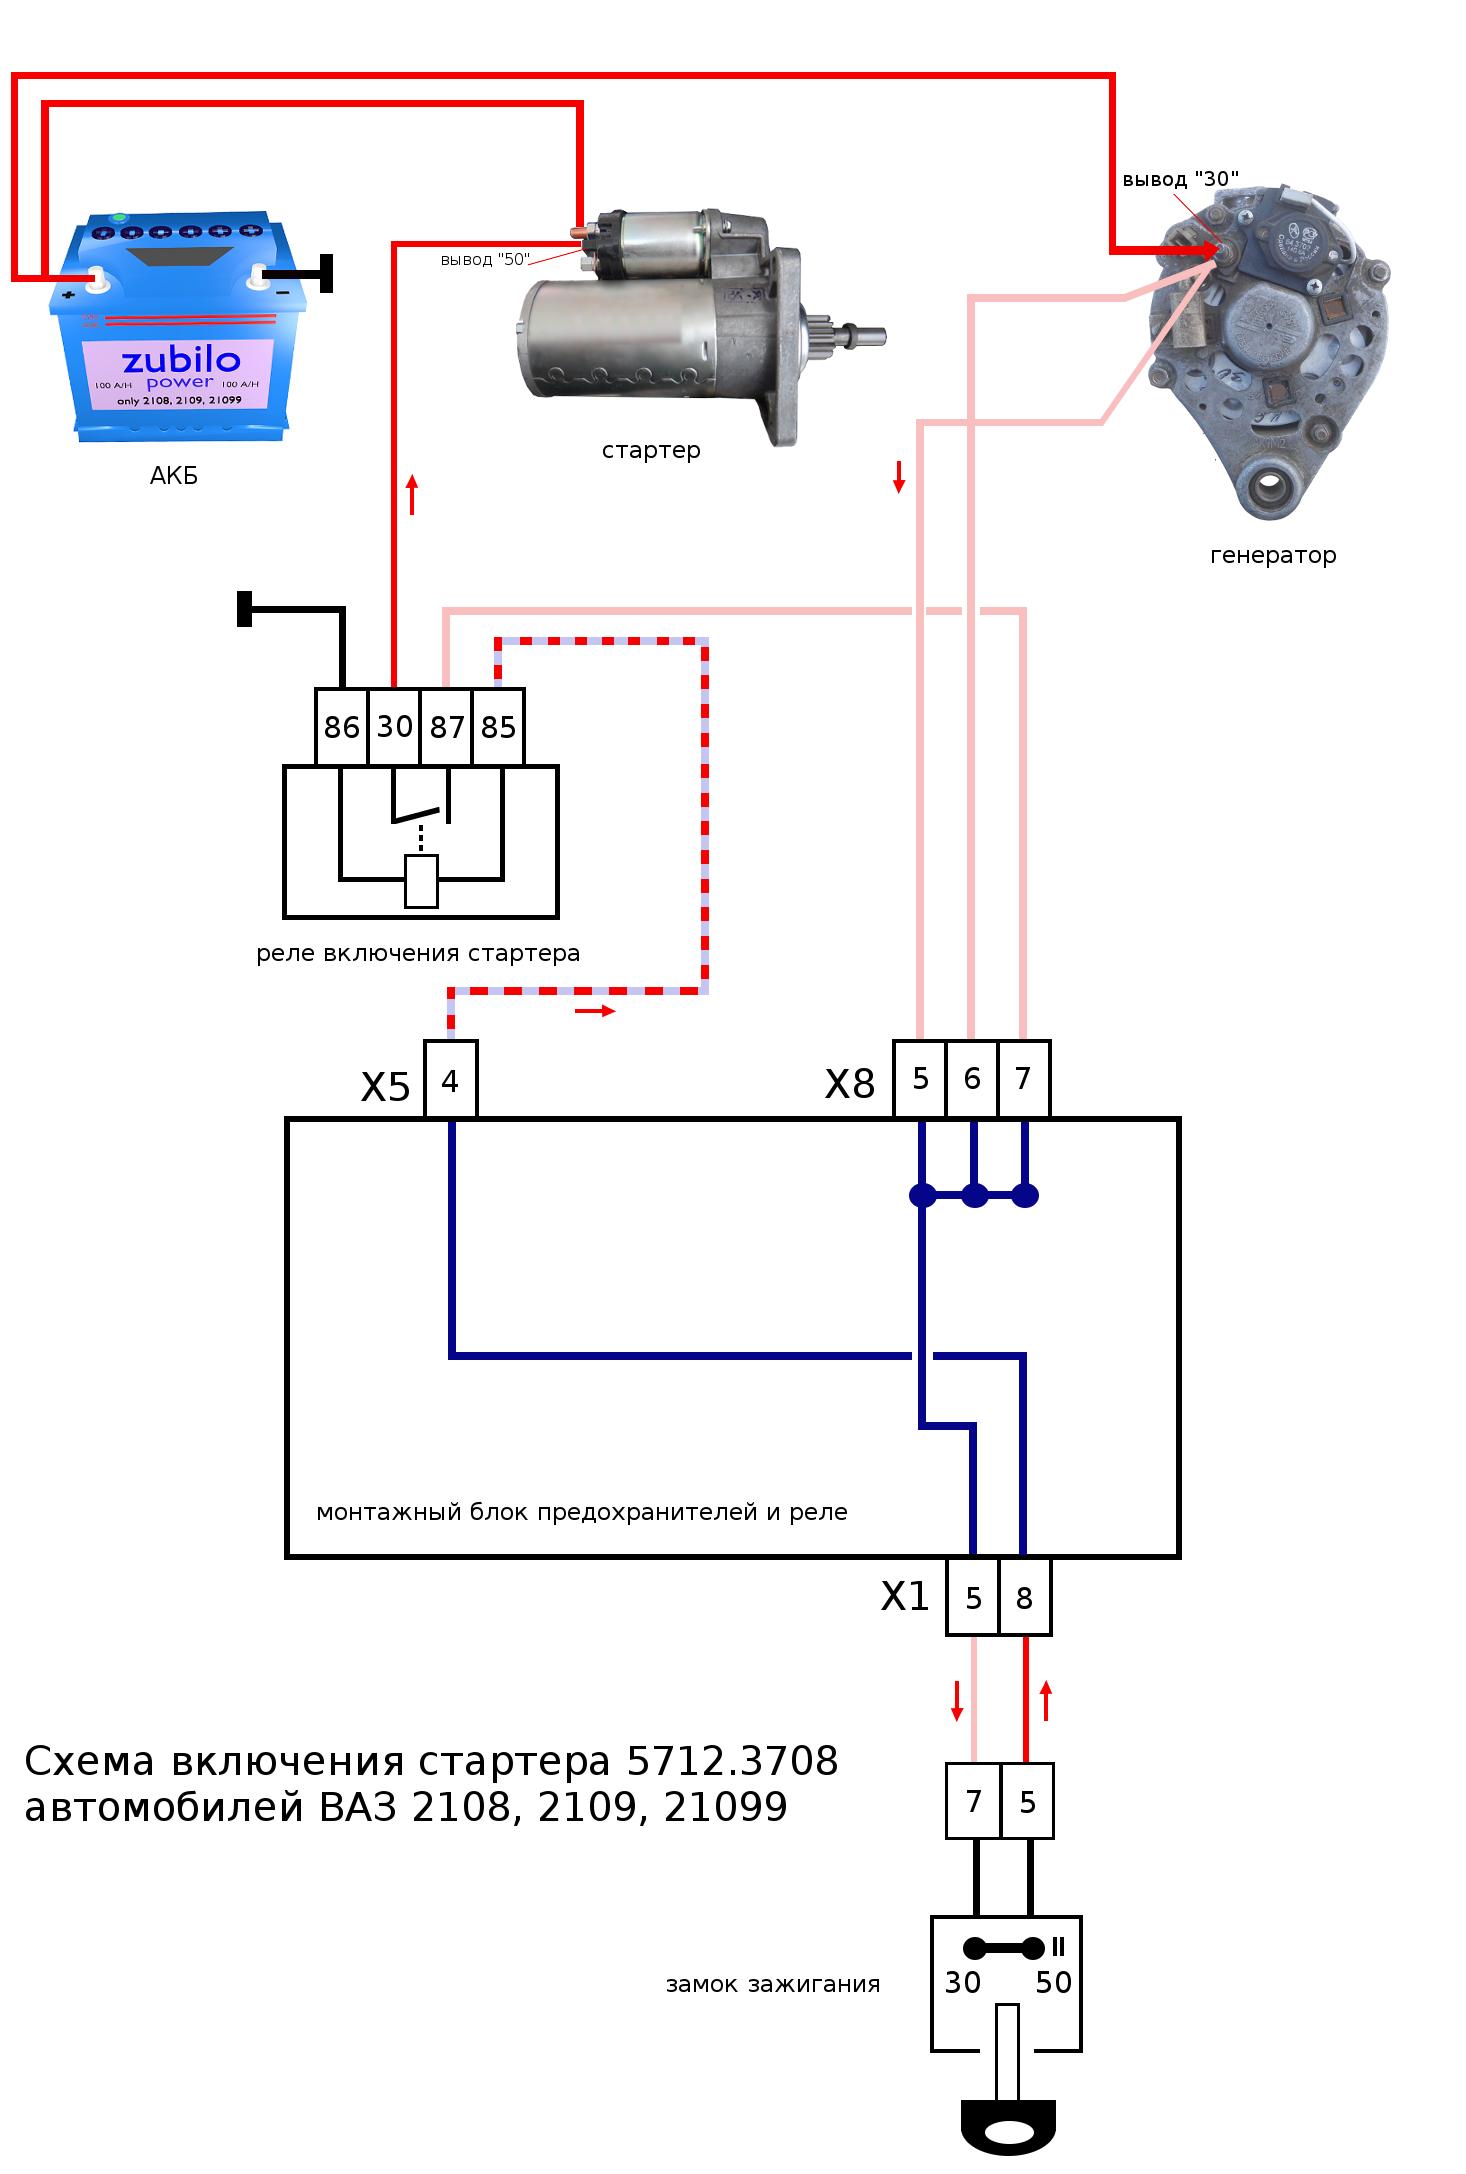 Эл. схема включение стартера ваз 2110